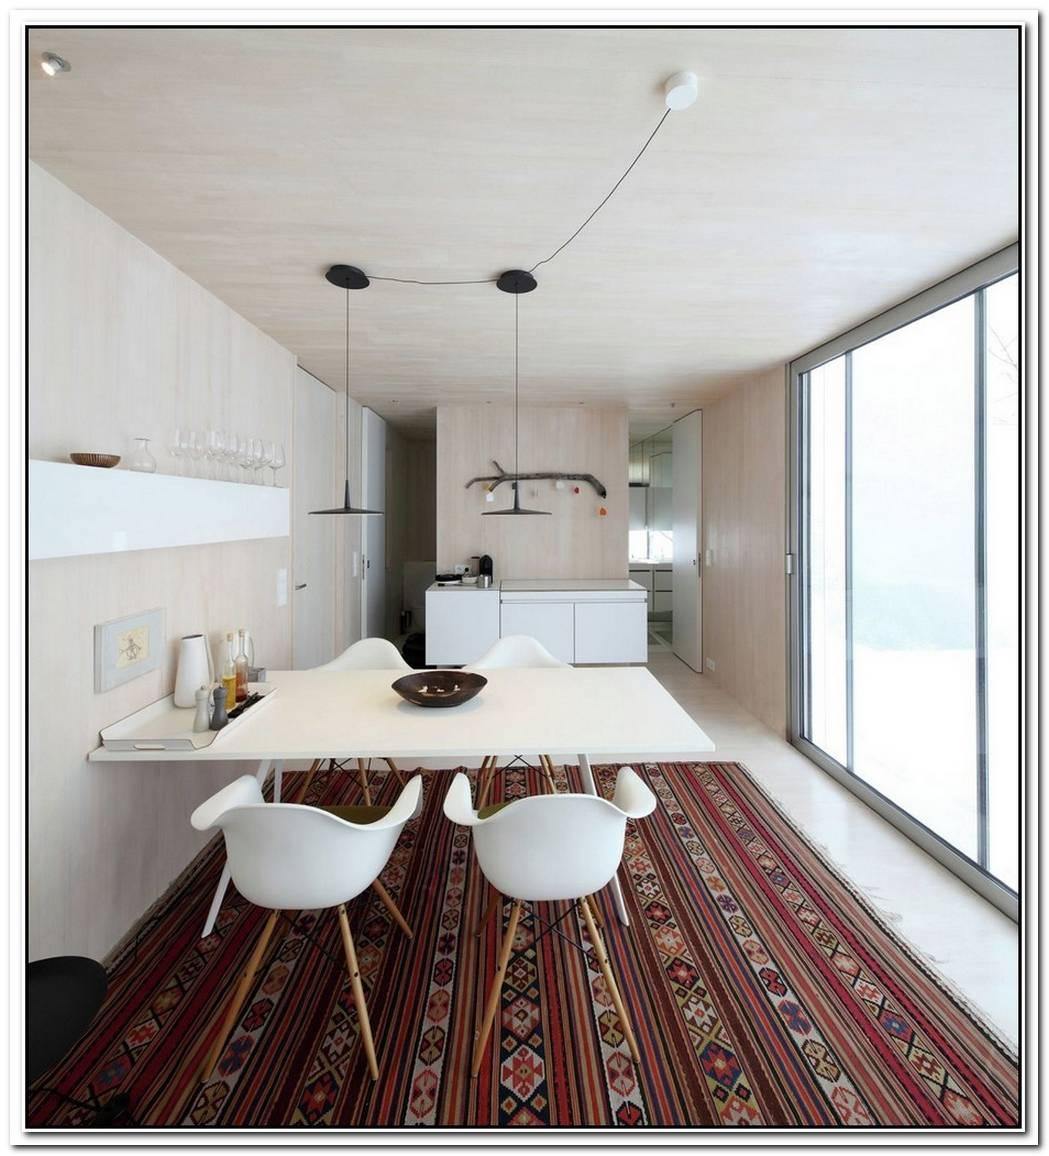 Compact Recreation Home With A Flexible Interior